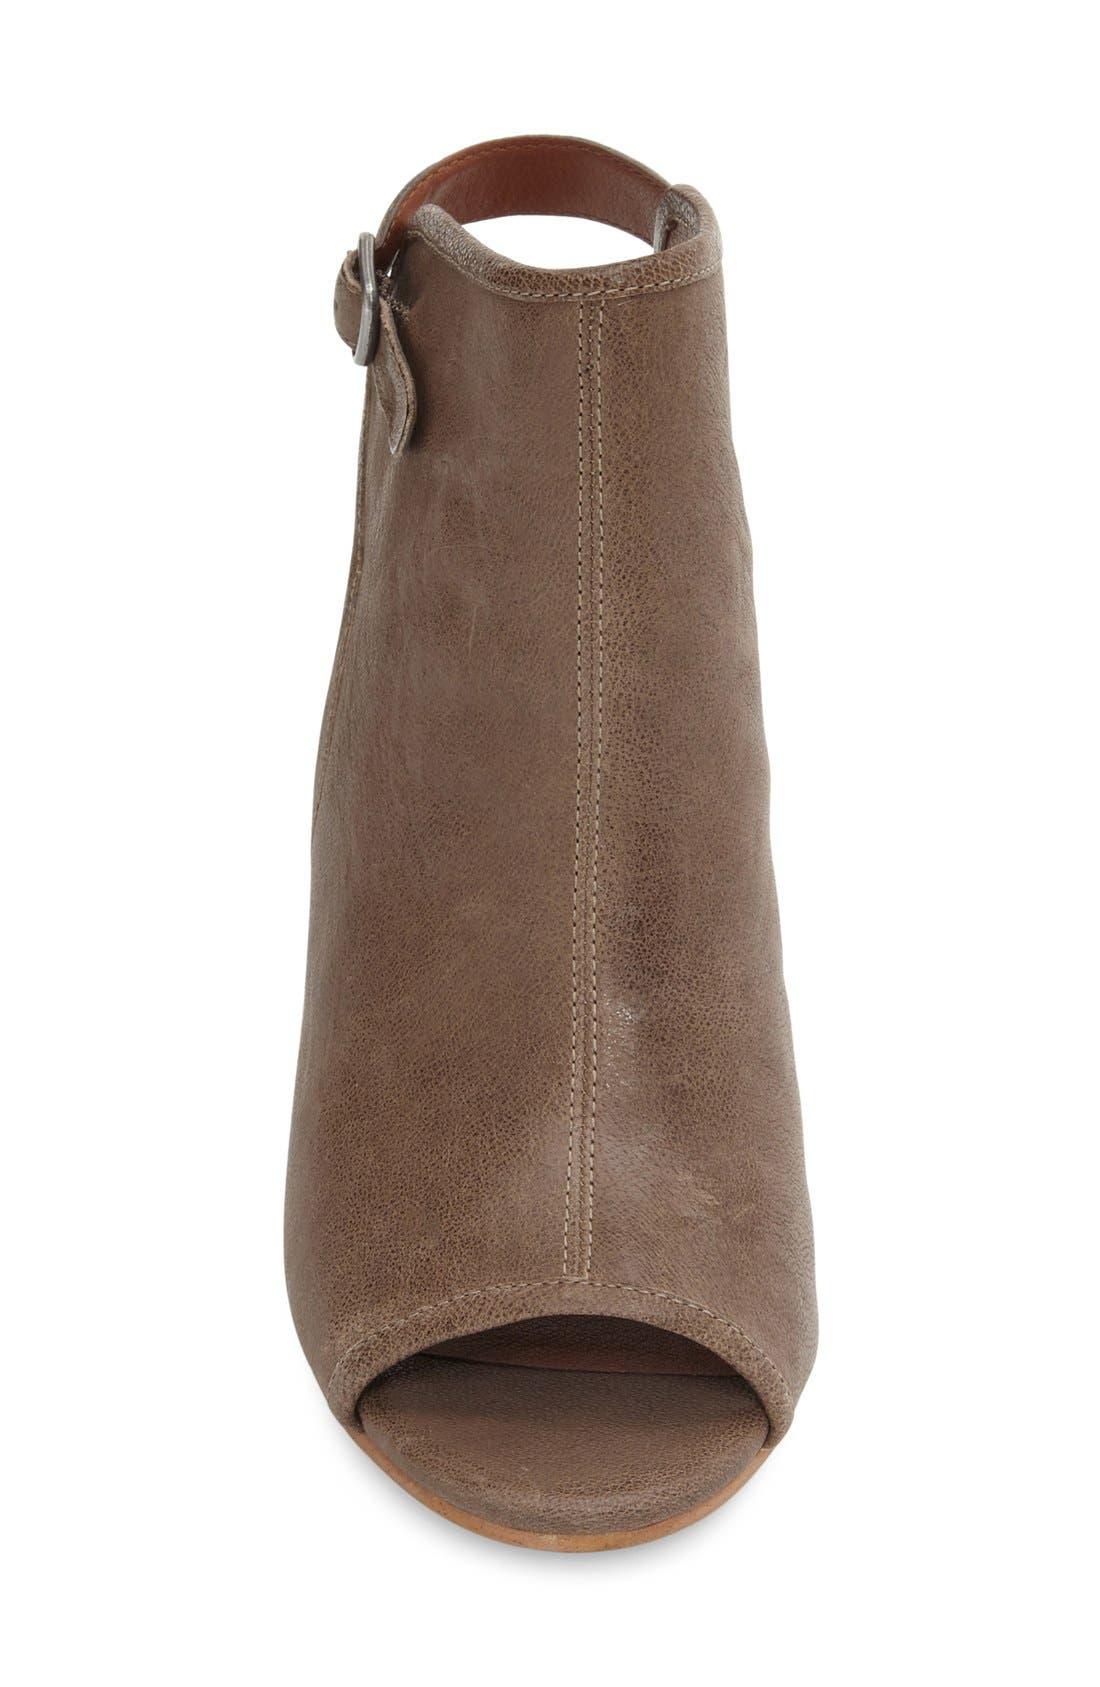 Alternate Image 3  - Lucky Brand 'Risza' Open Toe Wedge Bootie (Women)